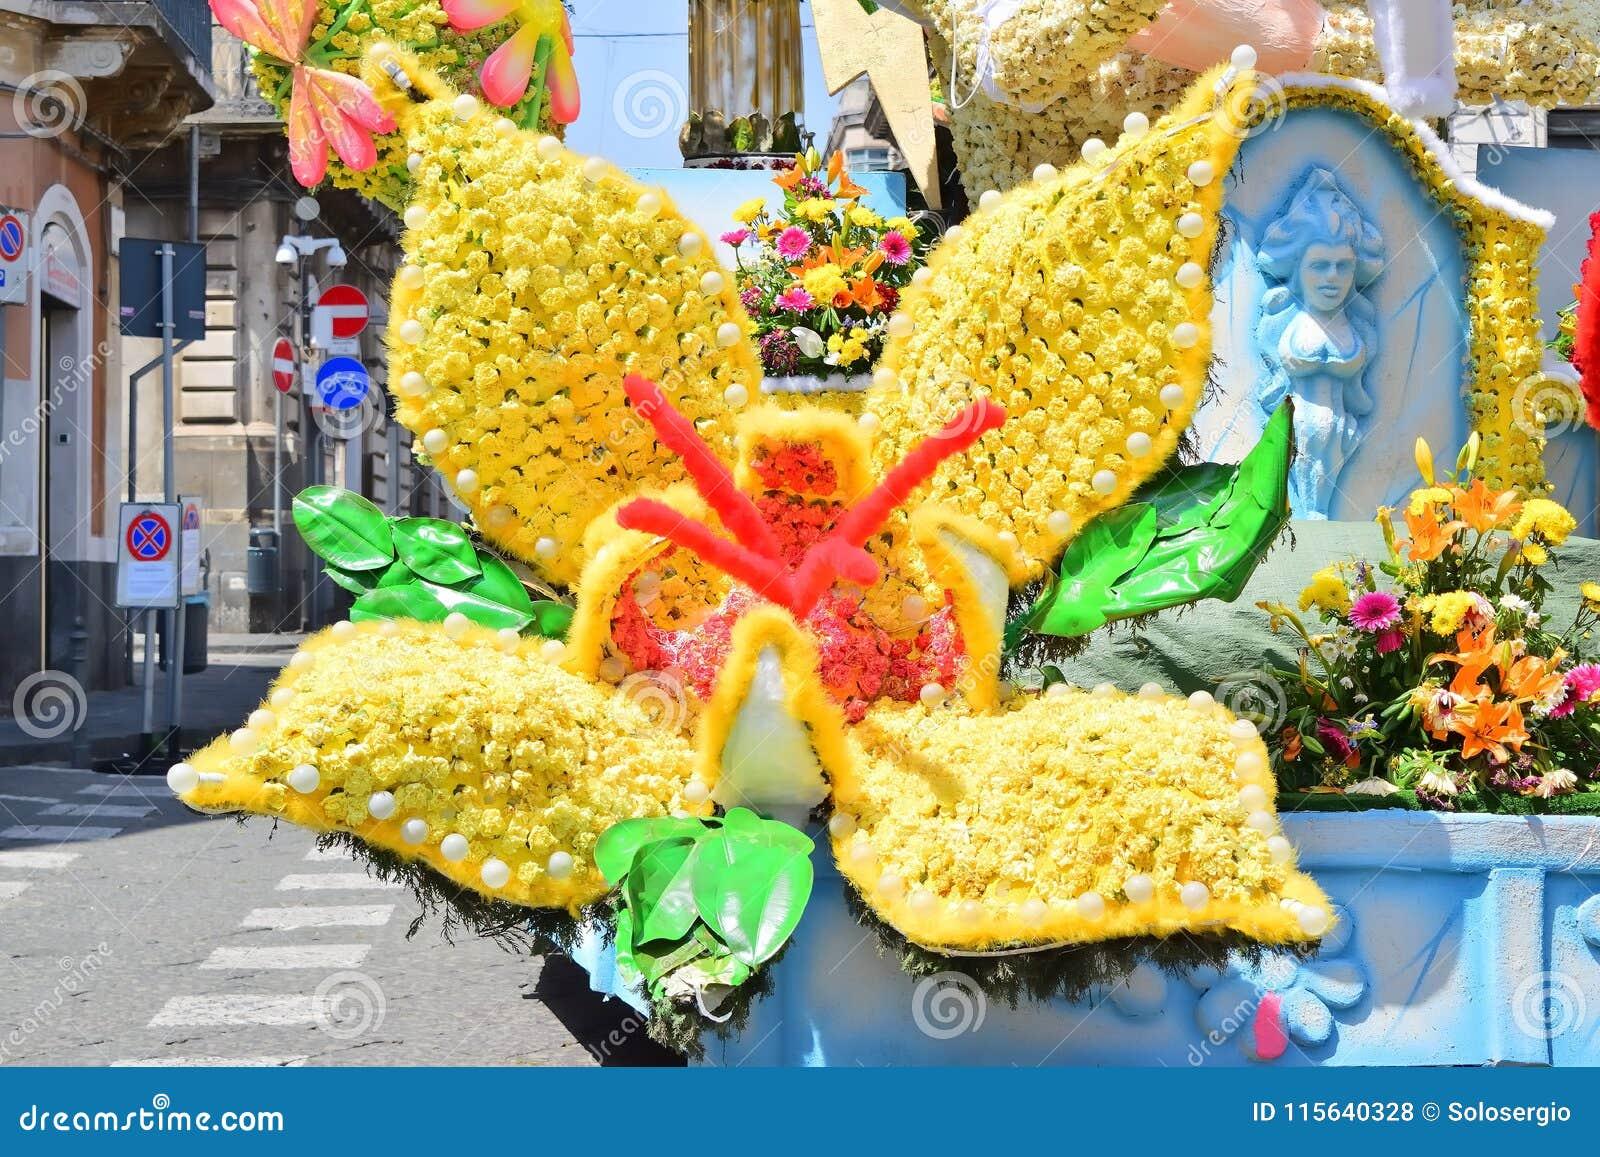 Flotador florido que representa diversos caracteres de la fantasía